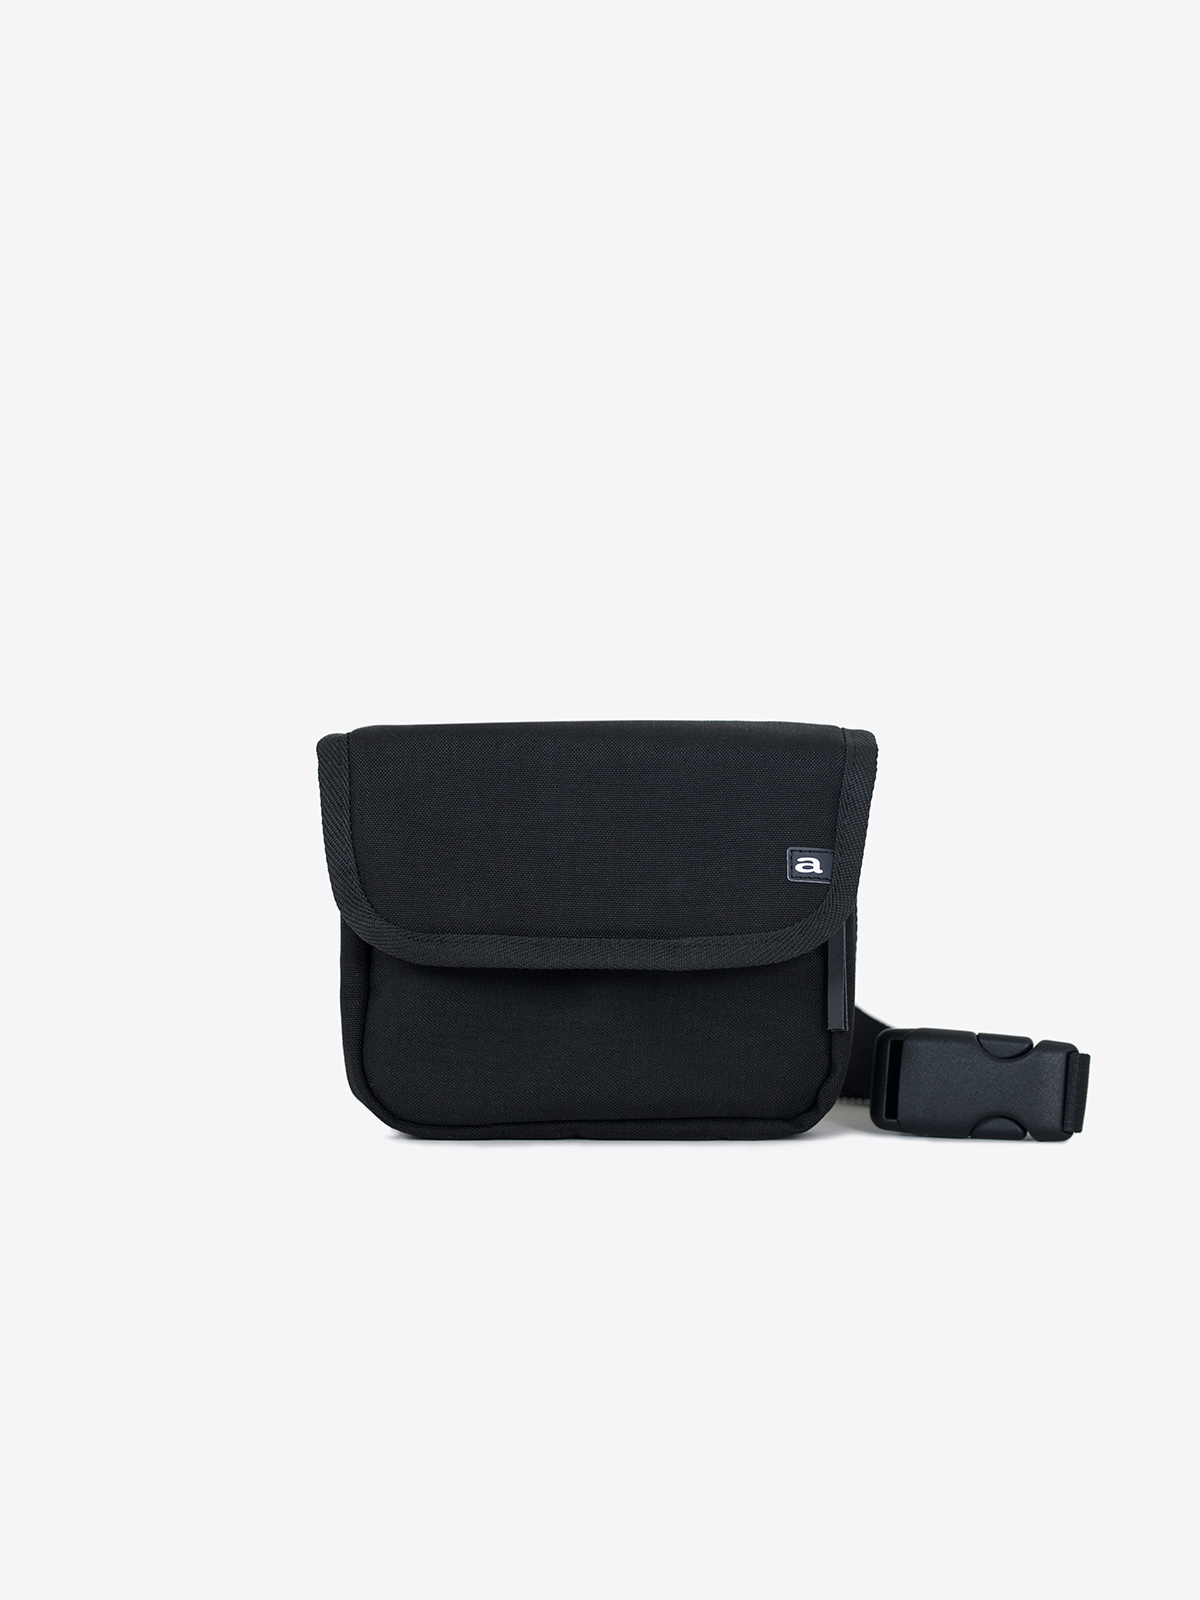 airbag craftworks zip | nylon black